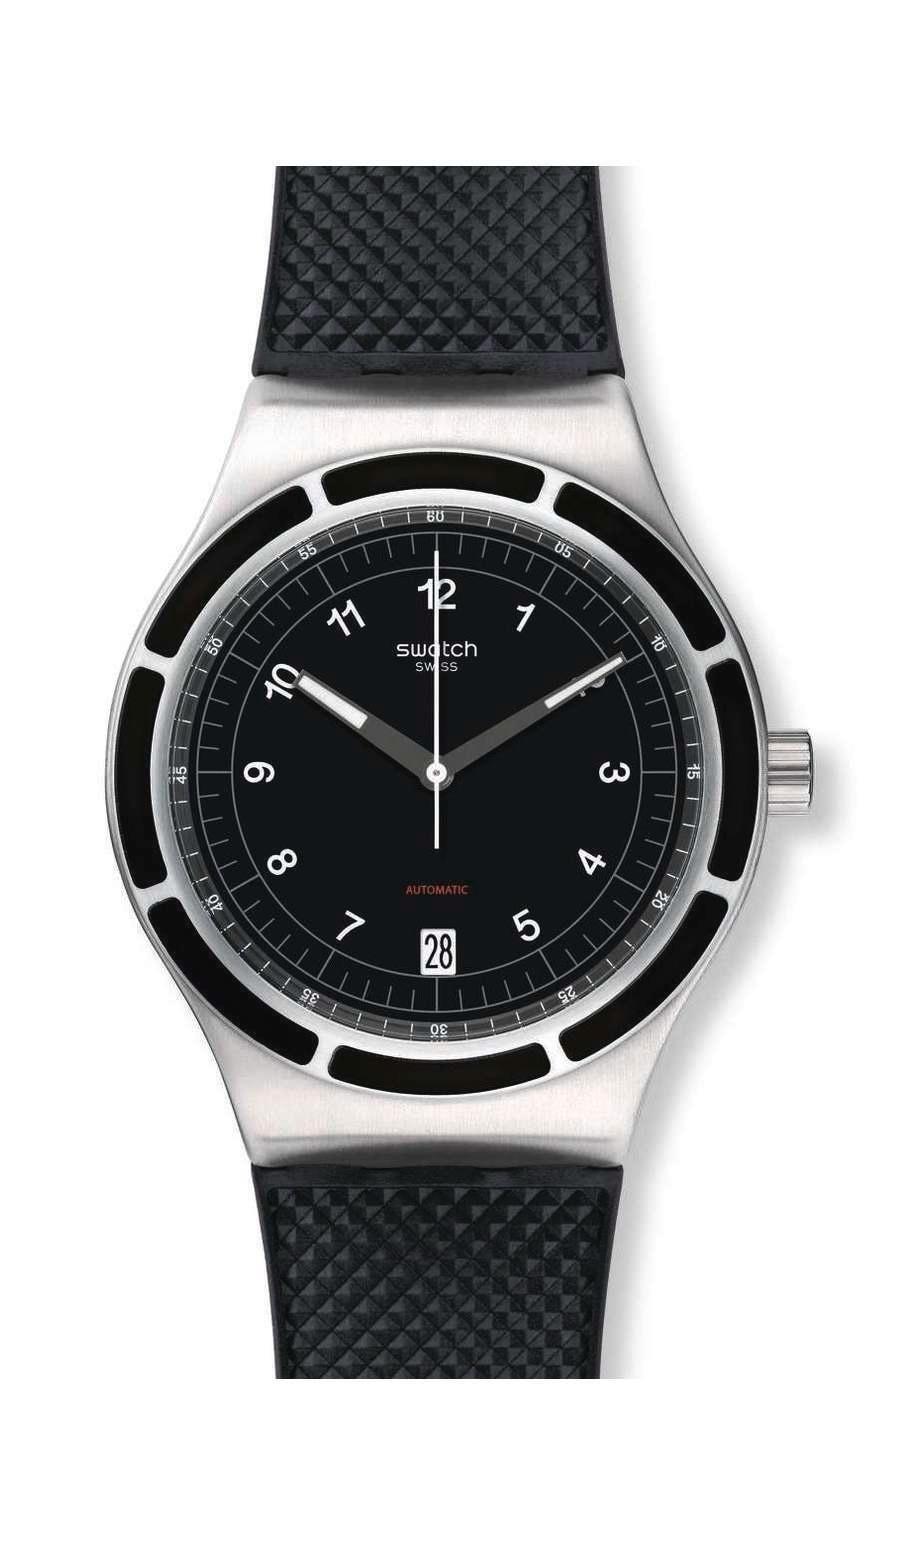 Swatch - SISTEM DARK - 1